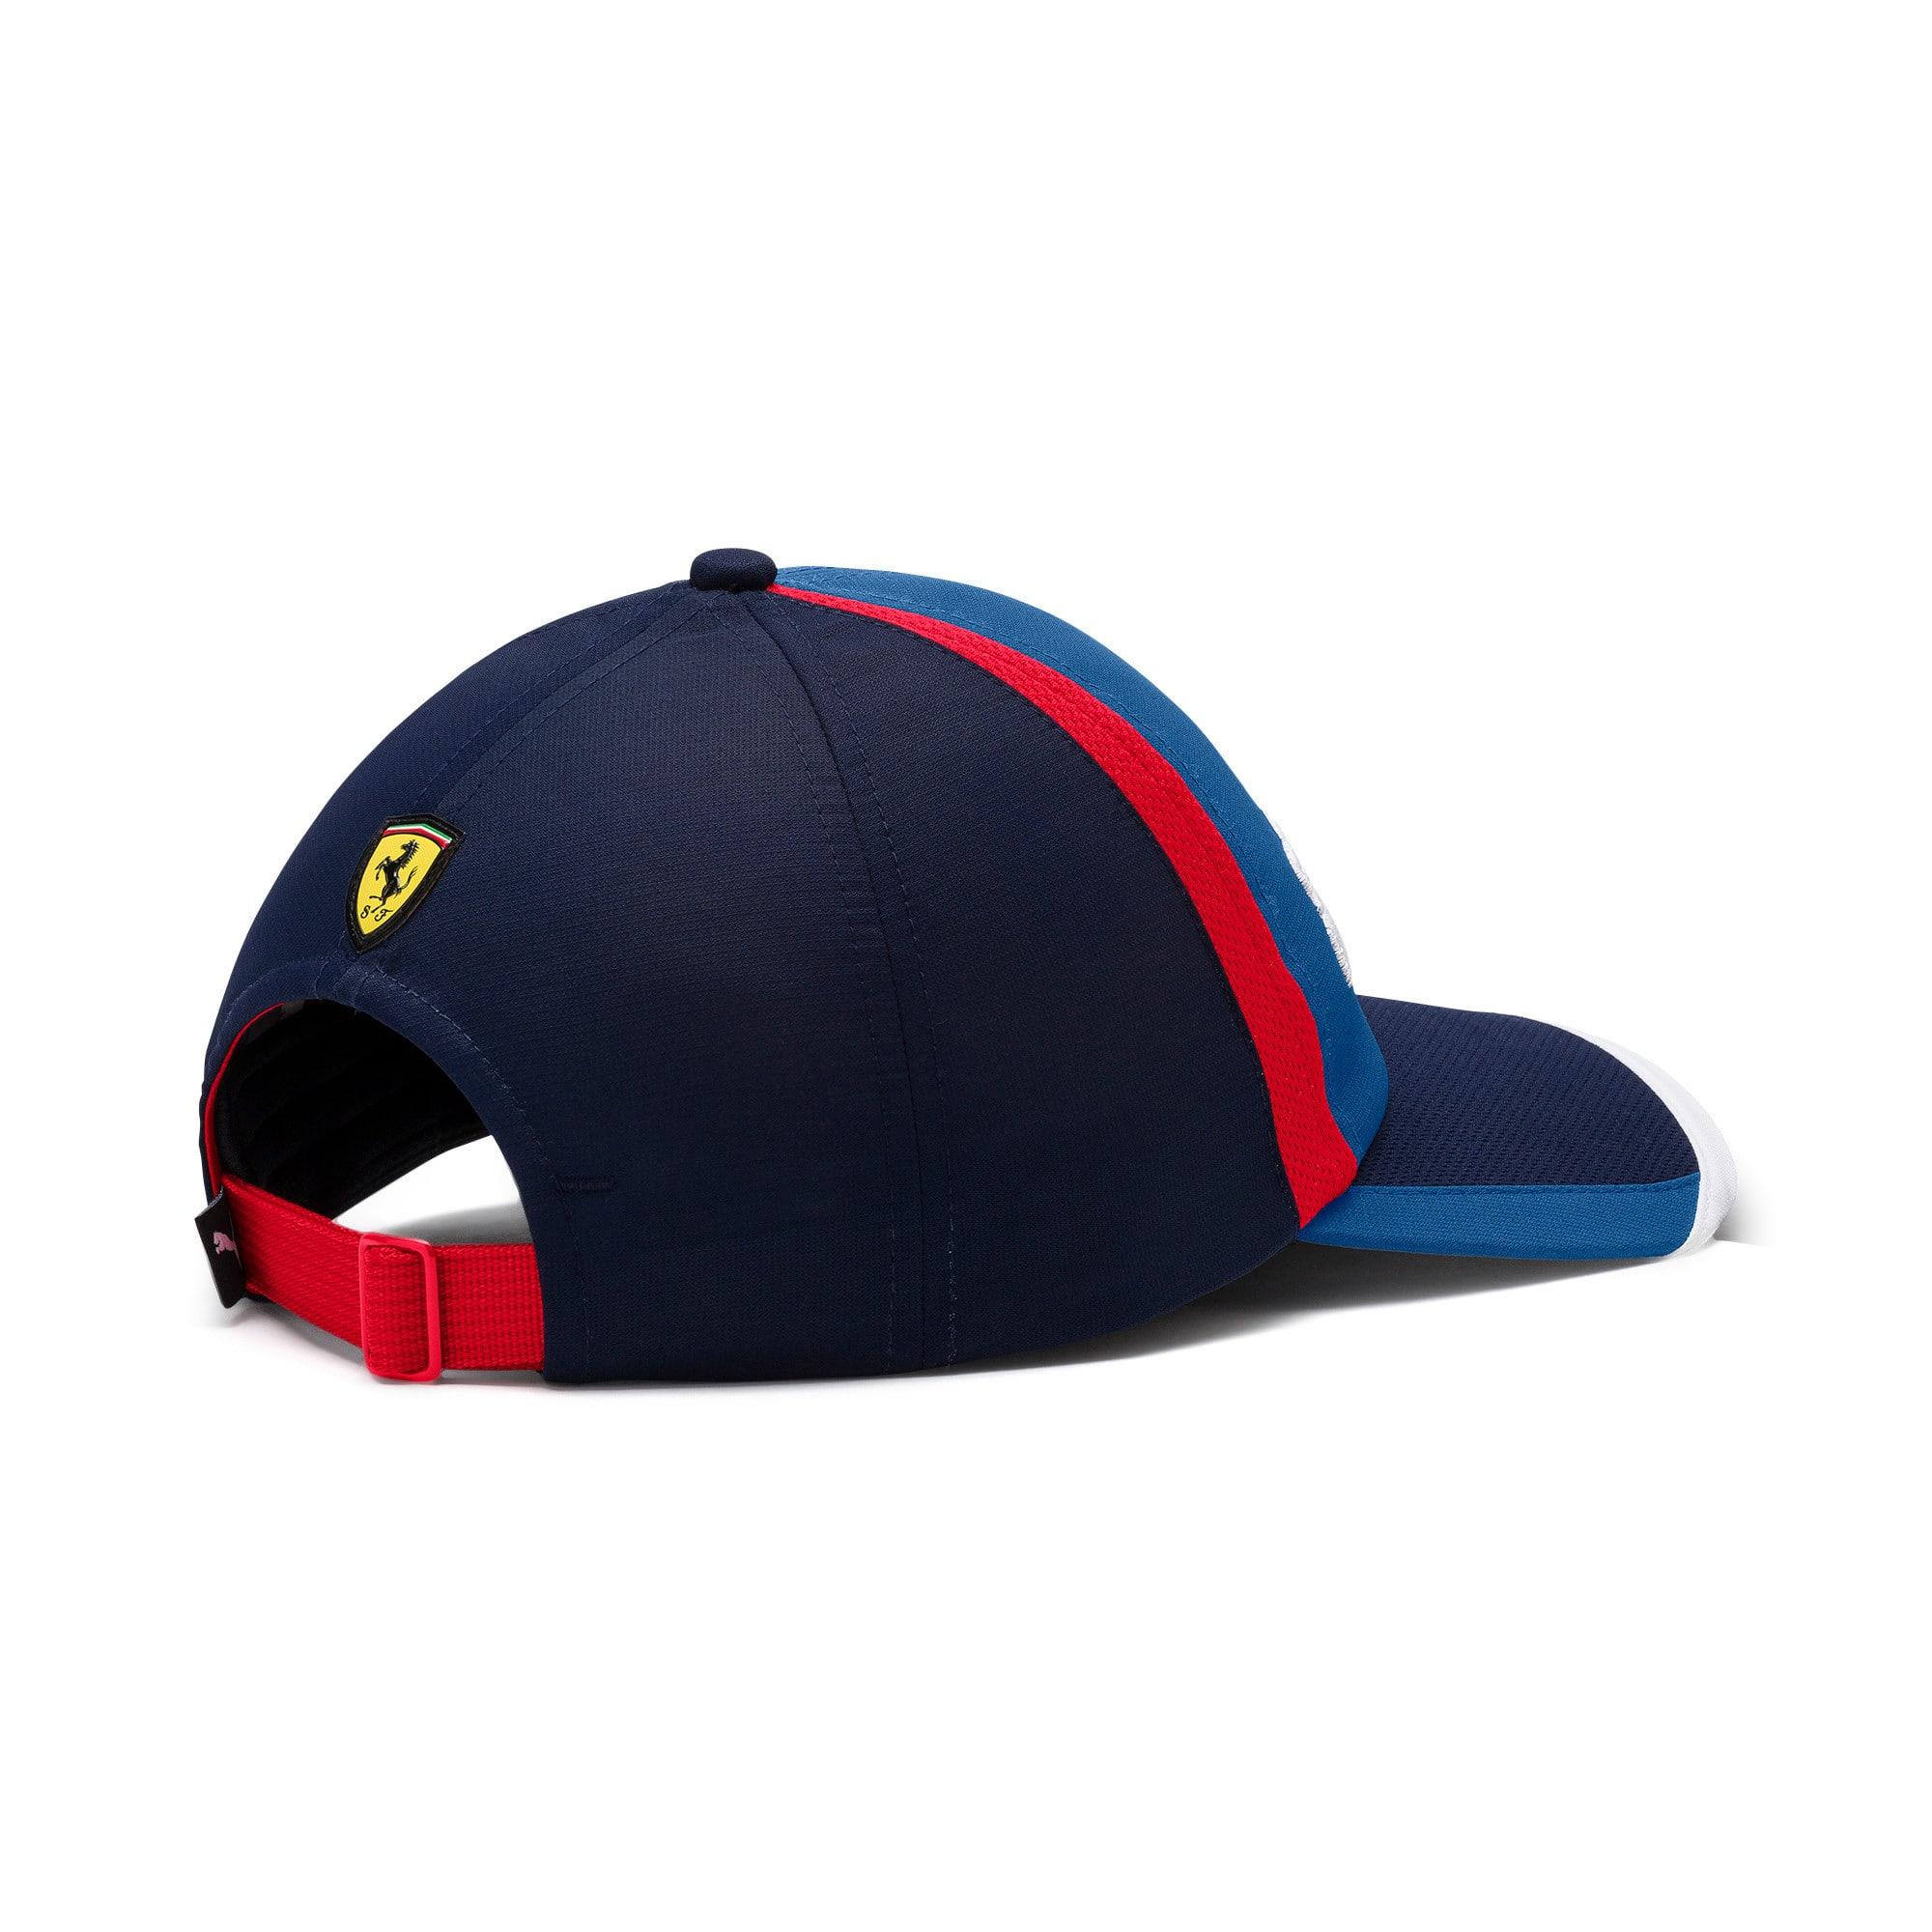 Thumbnail 3 of Scuderia Ferrari Fanwear Street Cap, Galaxy Blue-Rosso Corsa, medium